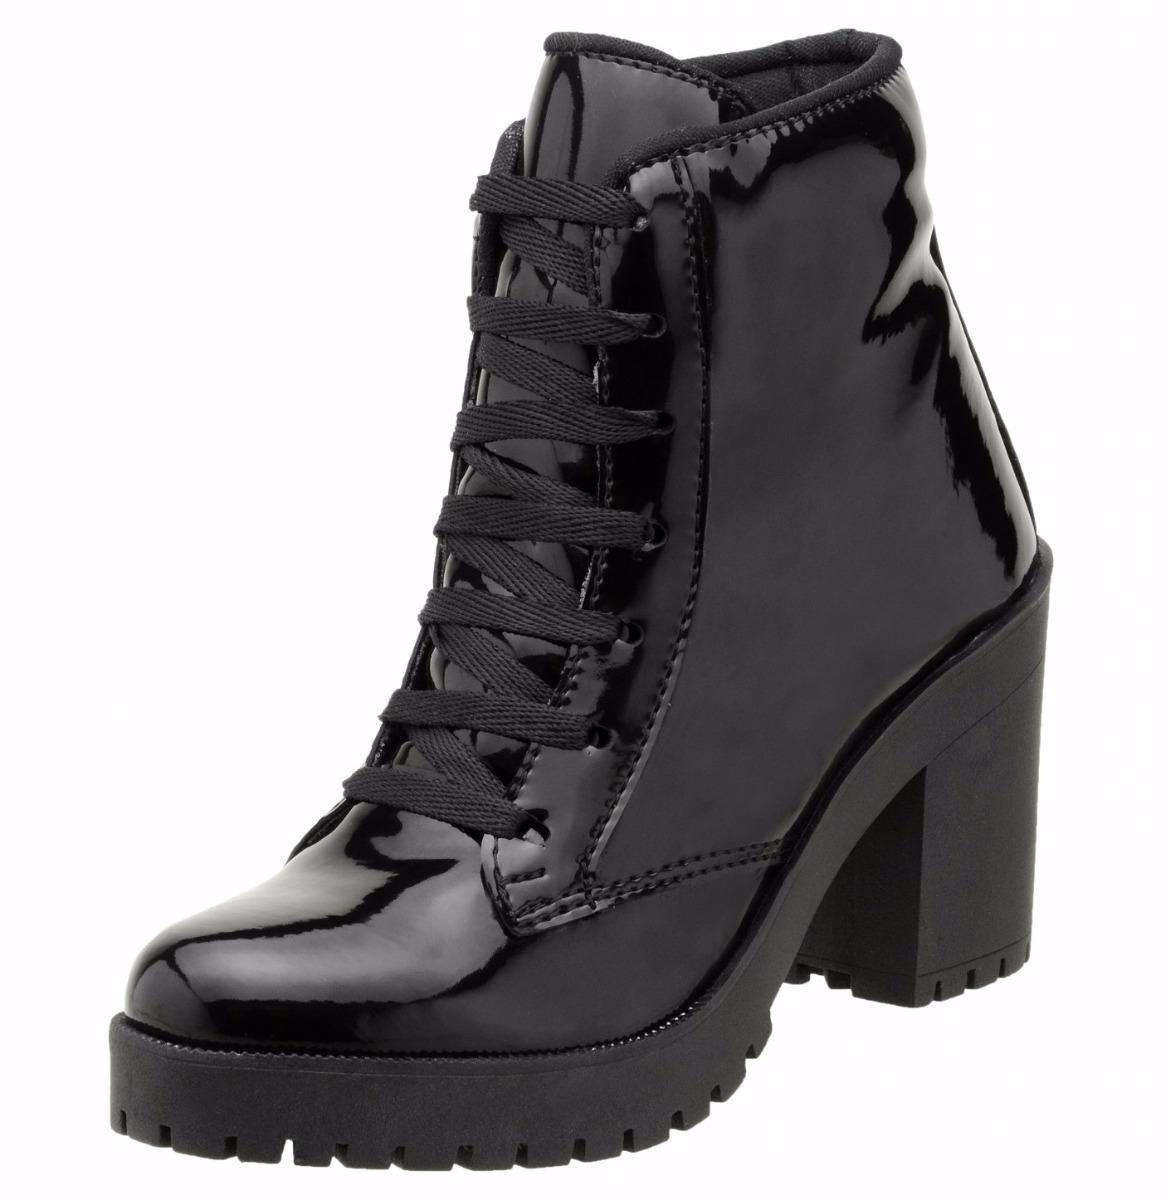 addedcde22e87 bota cano curto feminina ankle boot salto alto verniz - 030. Carregando  zoom.